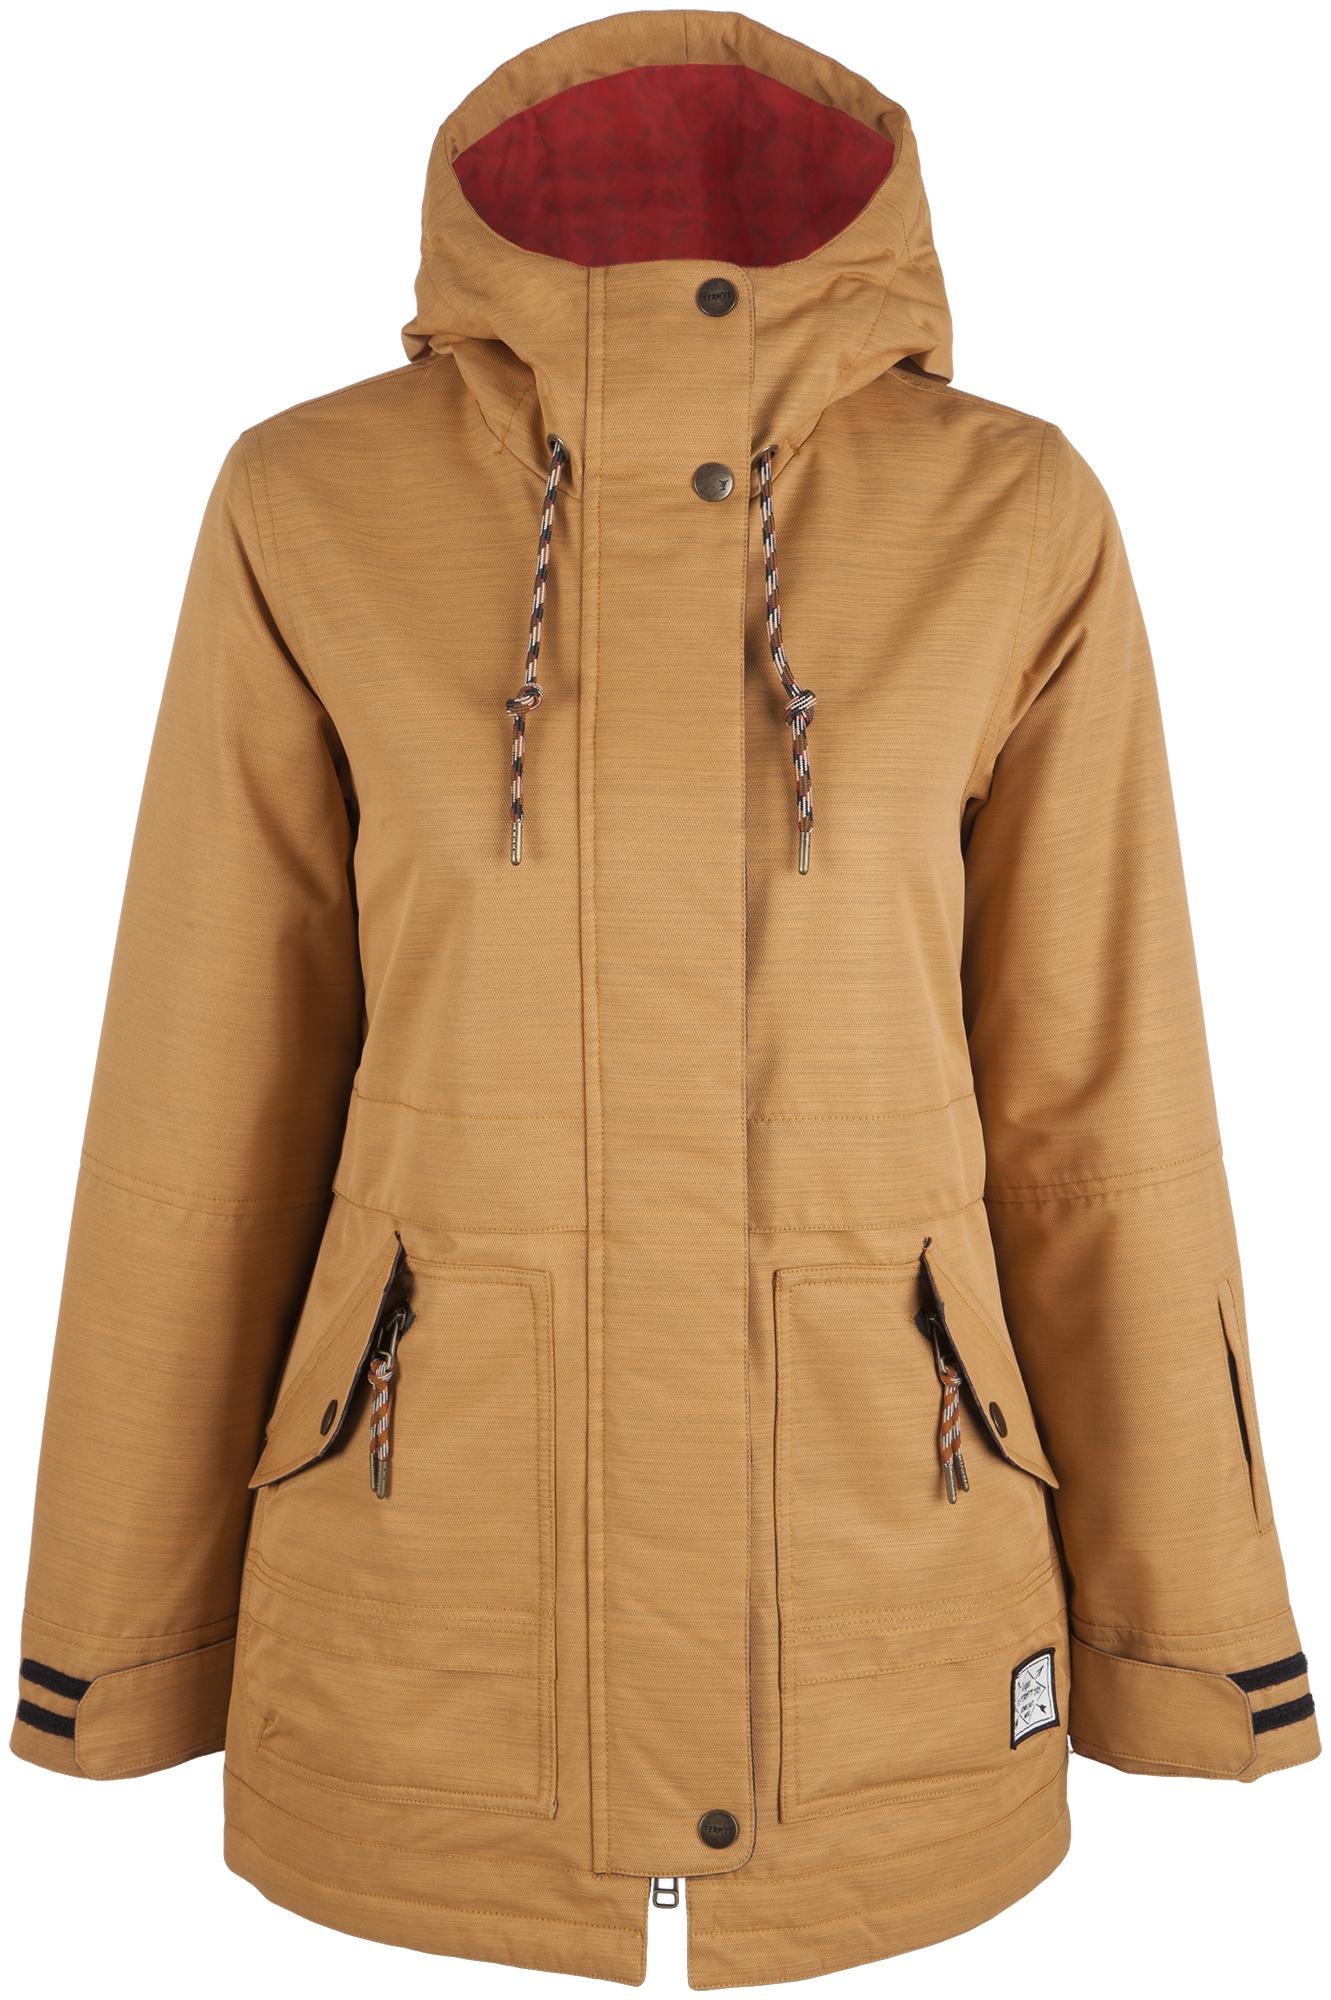 Termit Куртка утепленная женская Termit, размер 50 termit termit etesb008um